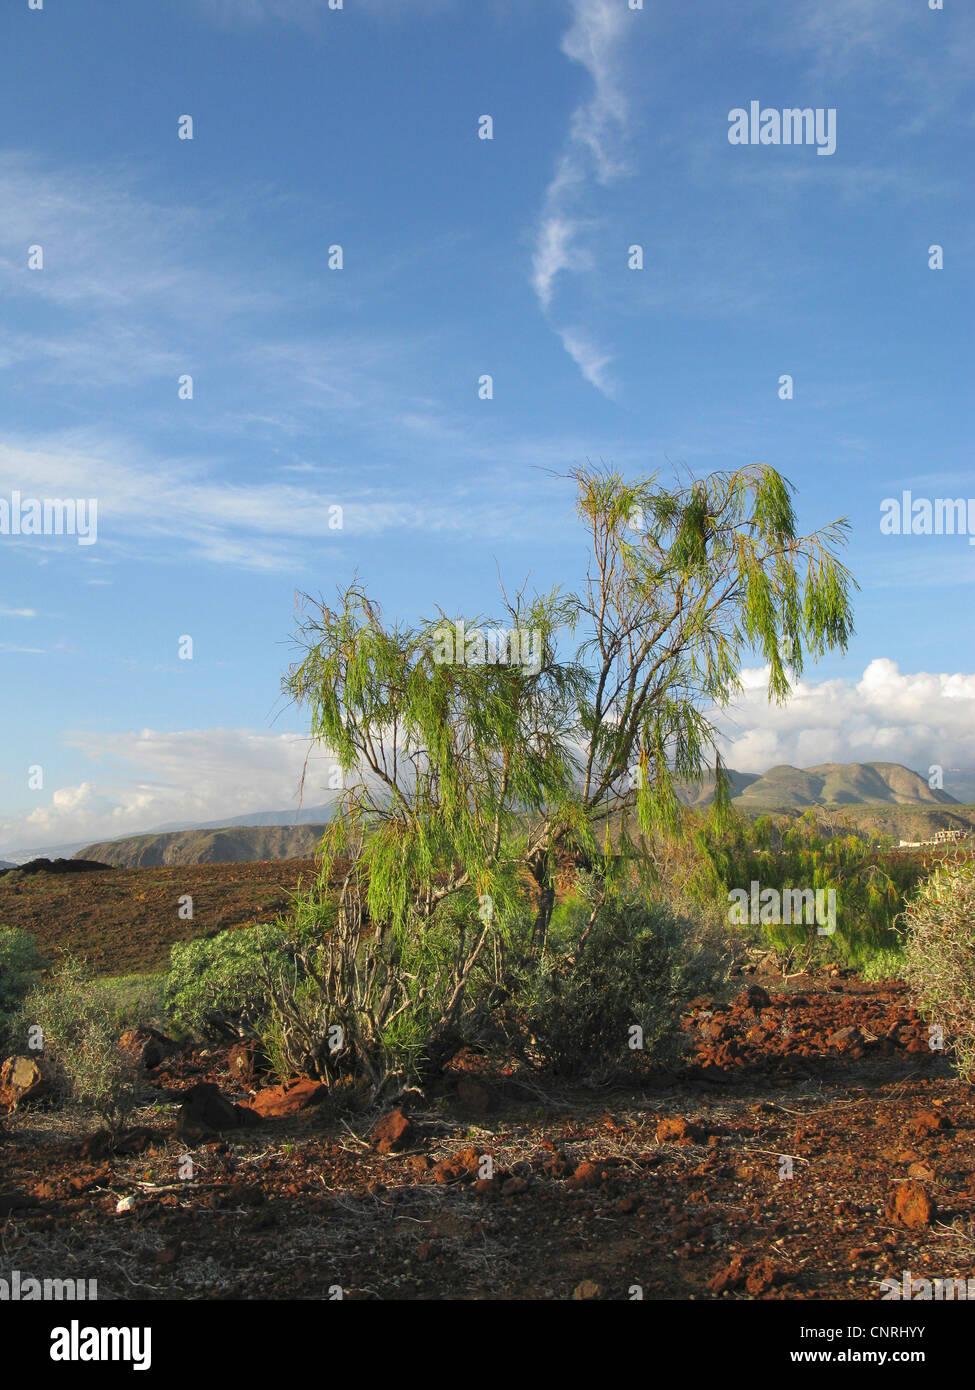 Plocama (Periploca pendula), in coastal vegetation, endemic to the Canary Islands, Canary Islands, Tenerife - Stock Image